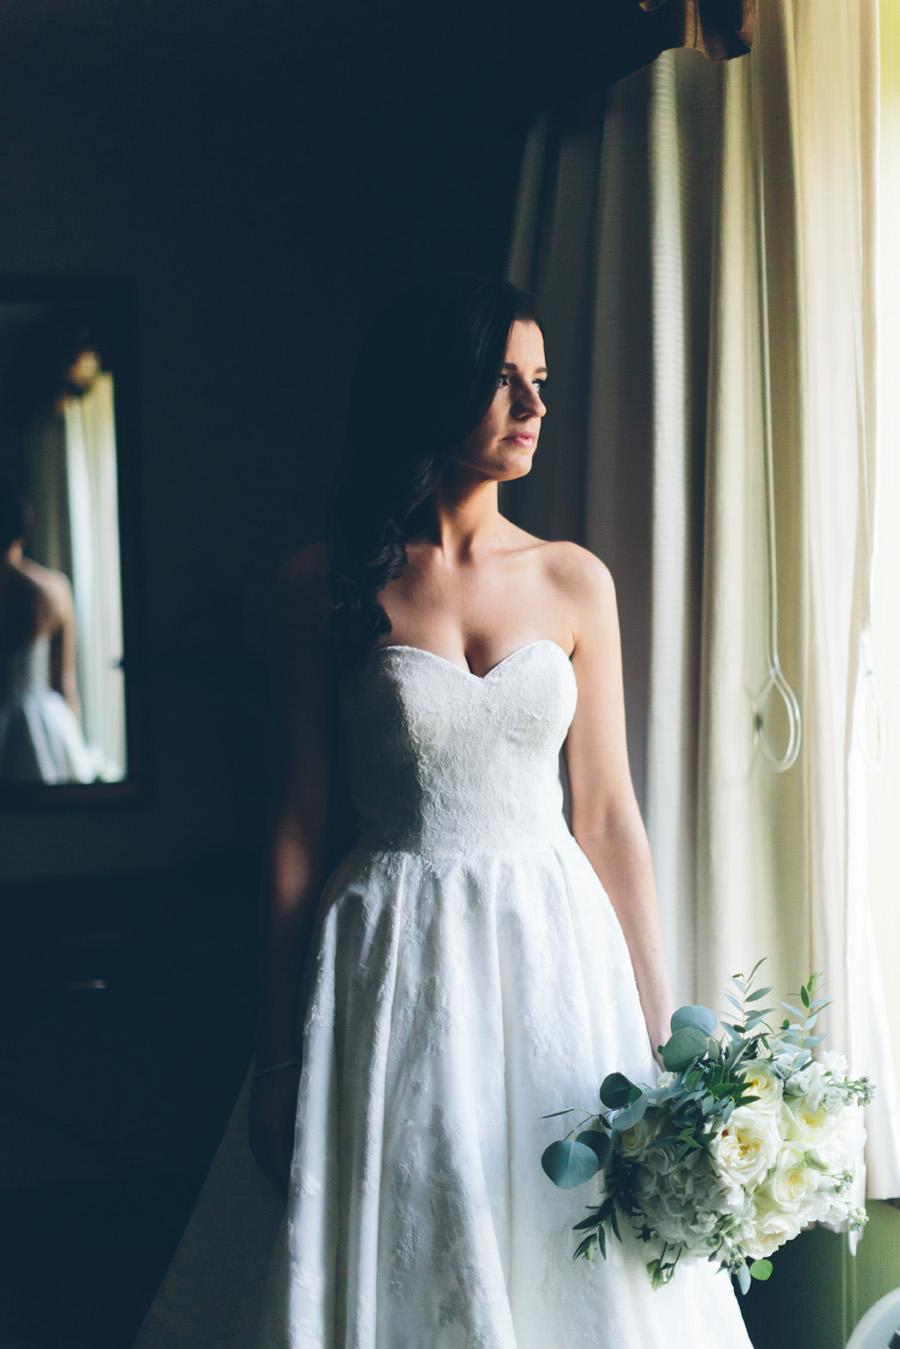 VICTORIA-BRIAN-NY-WEDDING-BRIDEPREP-CYNTHIACHUNG-0216.jpg